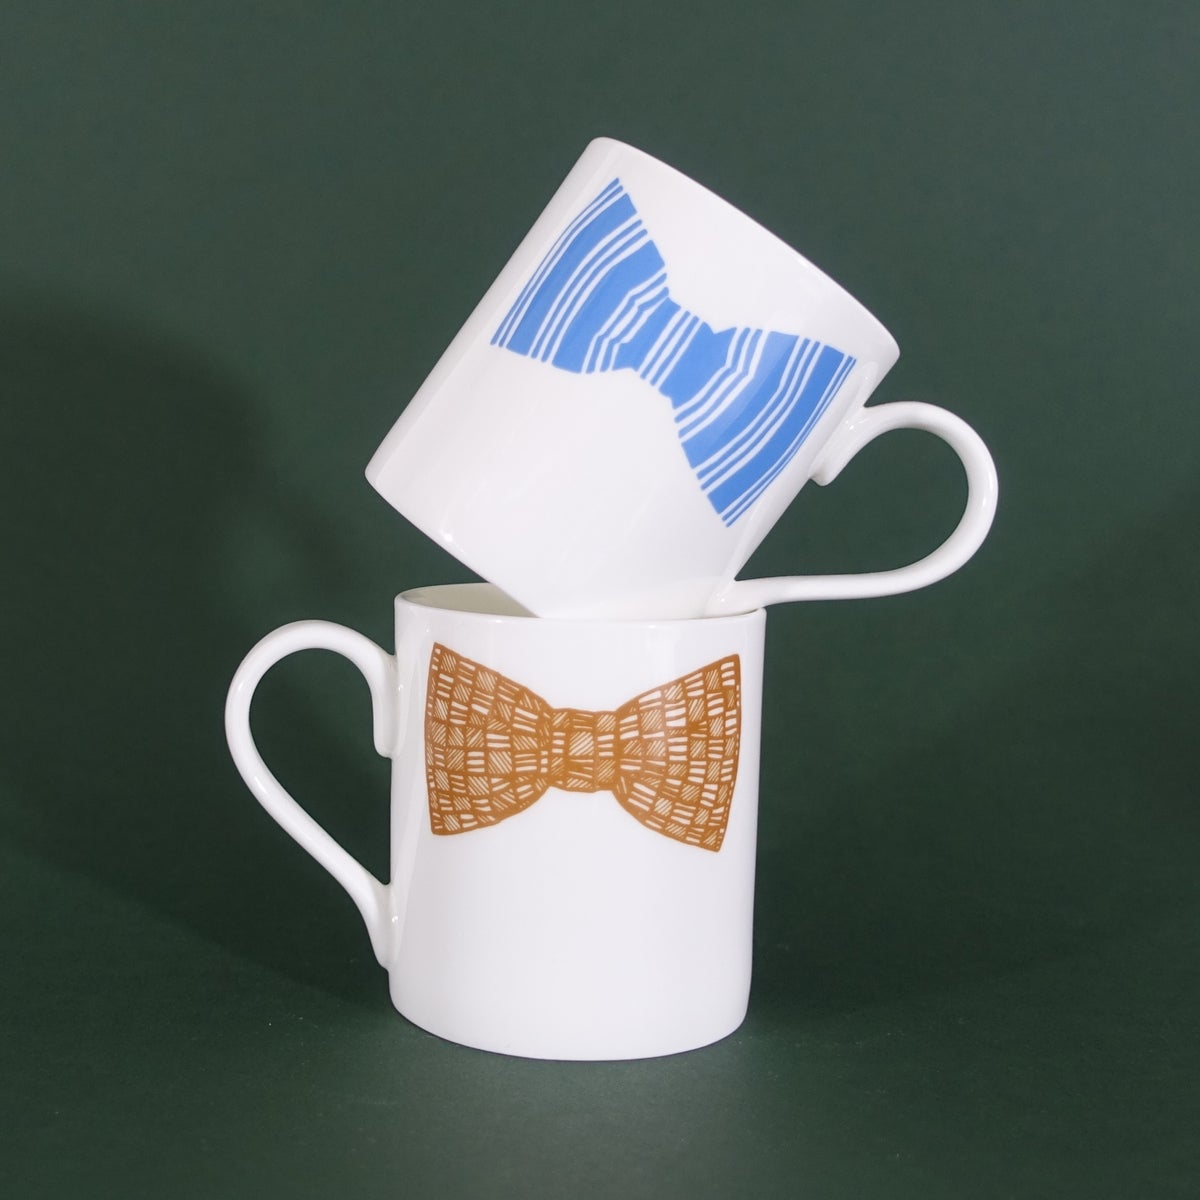 Image of Original Bow Tie Mug - Set of Two (Blue & Mustard)